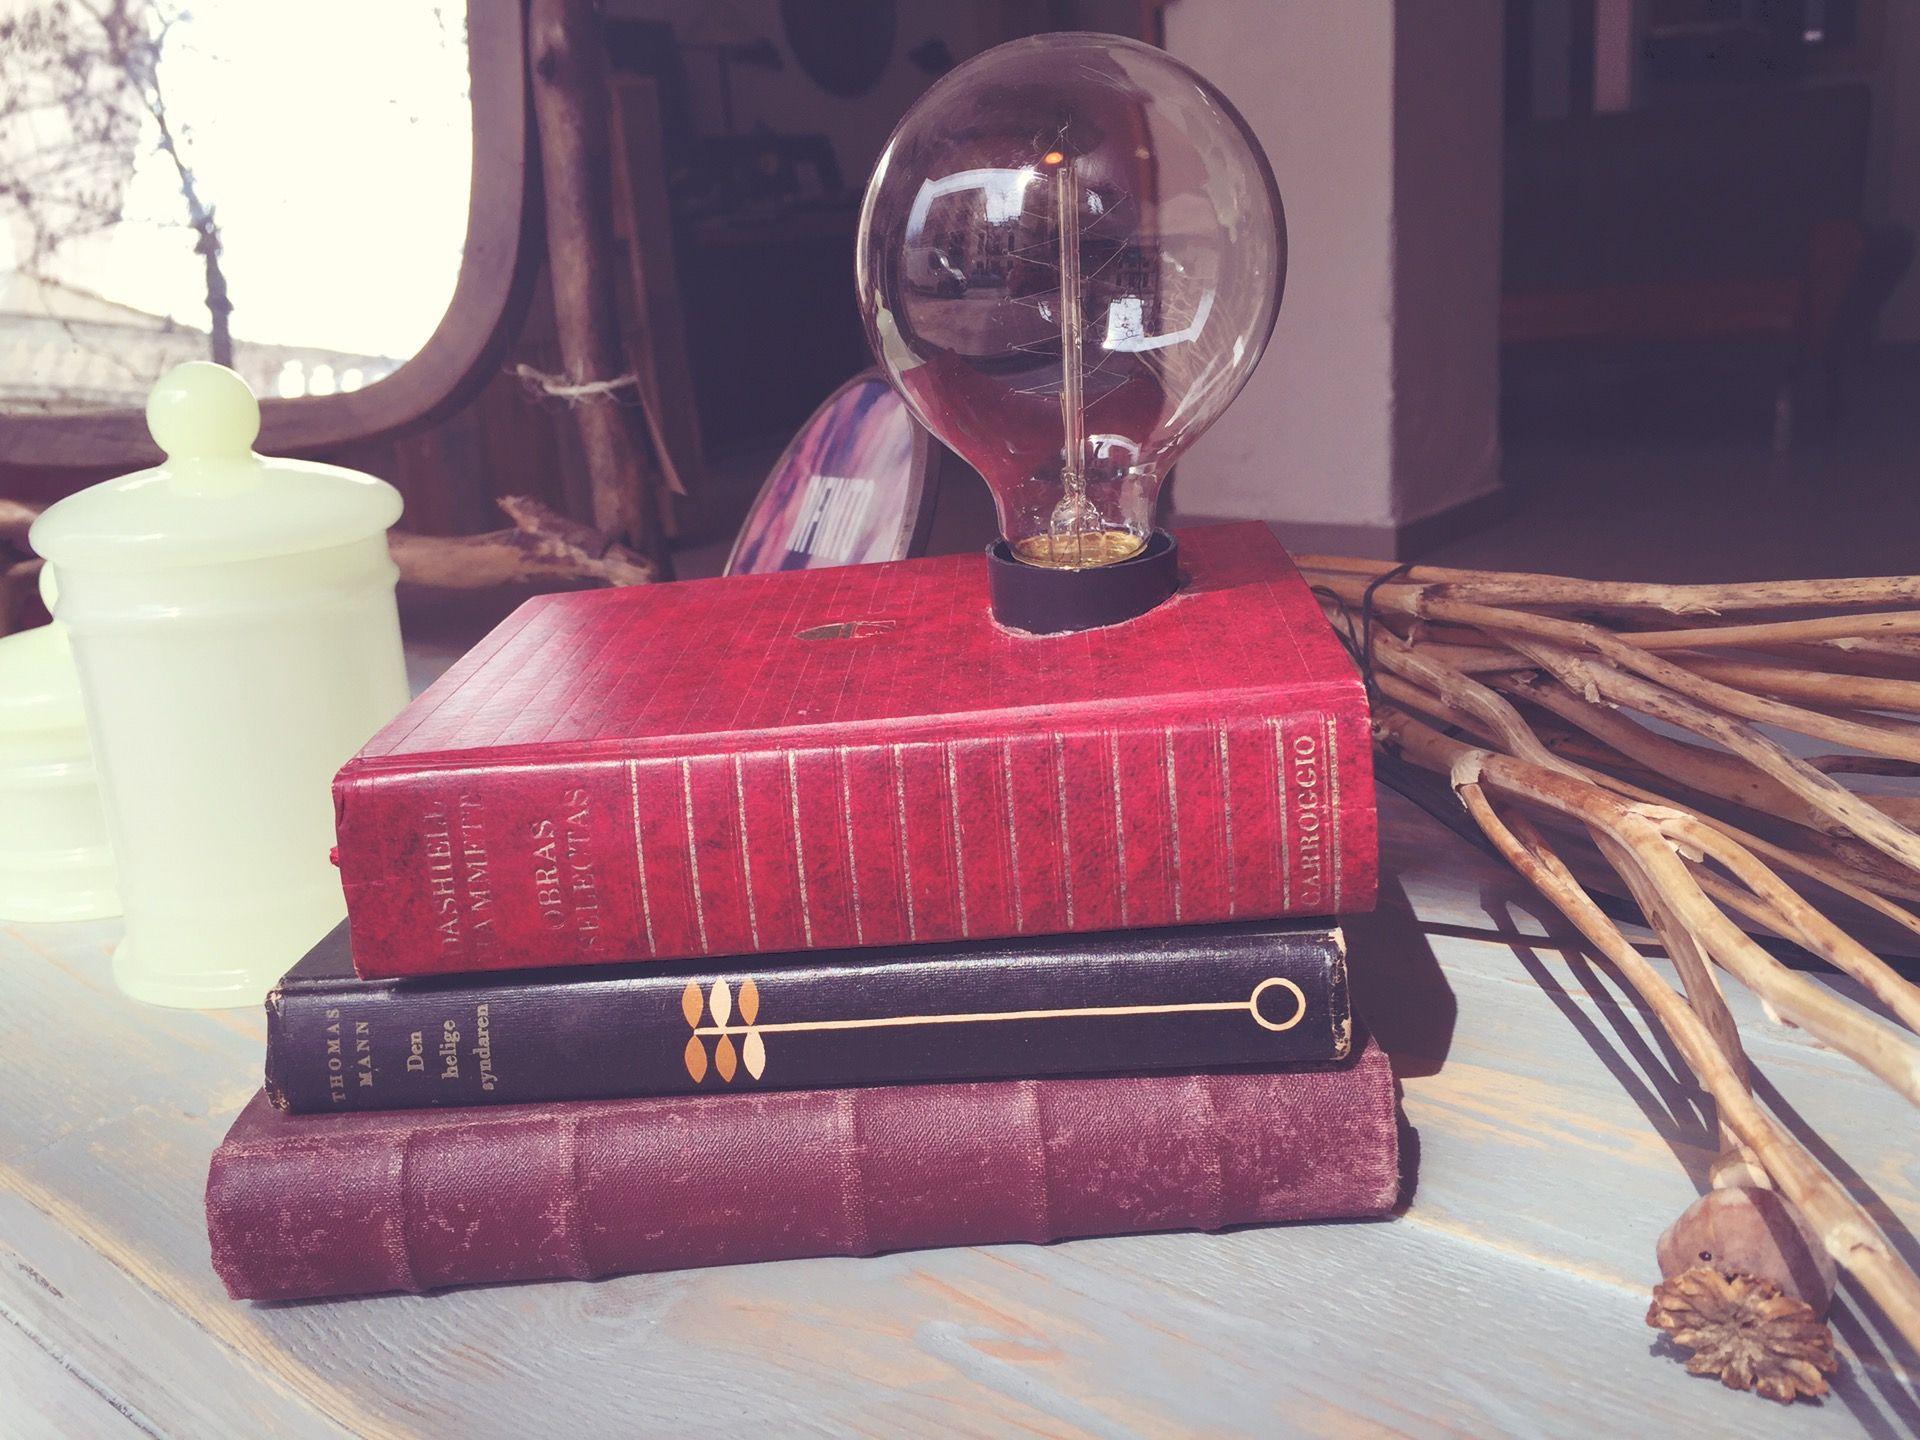 Lámpara base de libros y bombilla de filamentos.  #vintage #retro #robinwood #robinwoodpalma #muebleriasincera #sofa #forniture #muebles #chair #table #closet #beautiful #me #love #homedecor #decor #vintagelove #design #homedesign #chalkpaint #style #colour #interiordesign #diy #vintageluxe #interior #furniture #restored #luck #eco #pale #pallet #wood #bombilla #bombillafilamentos #light #lampara #bombillafilamentos #bombilla